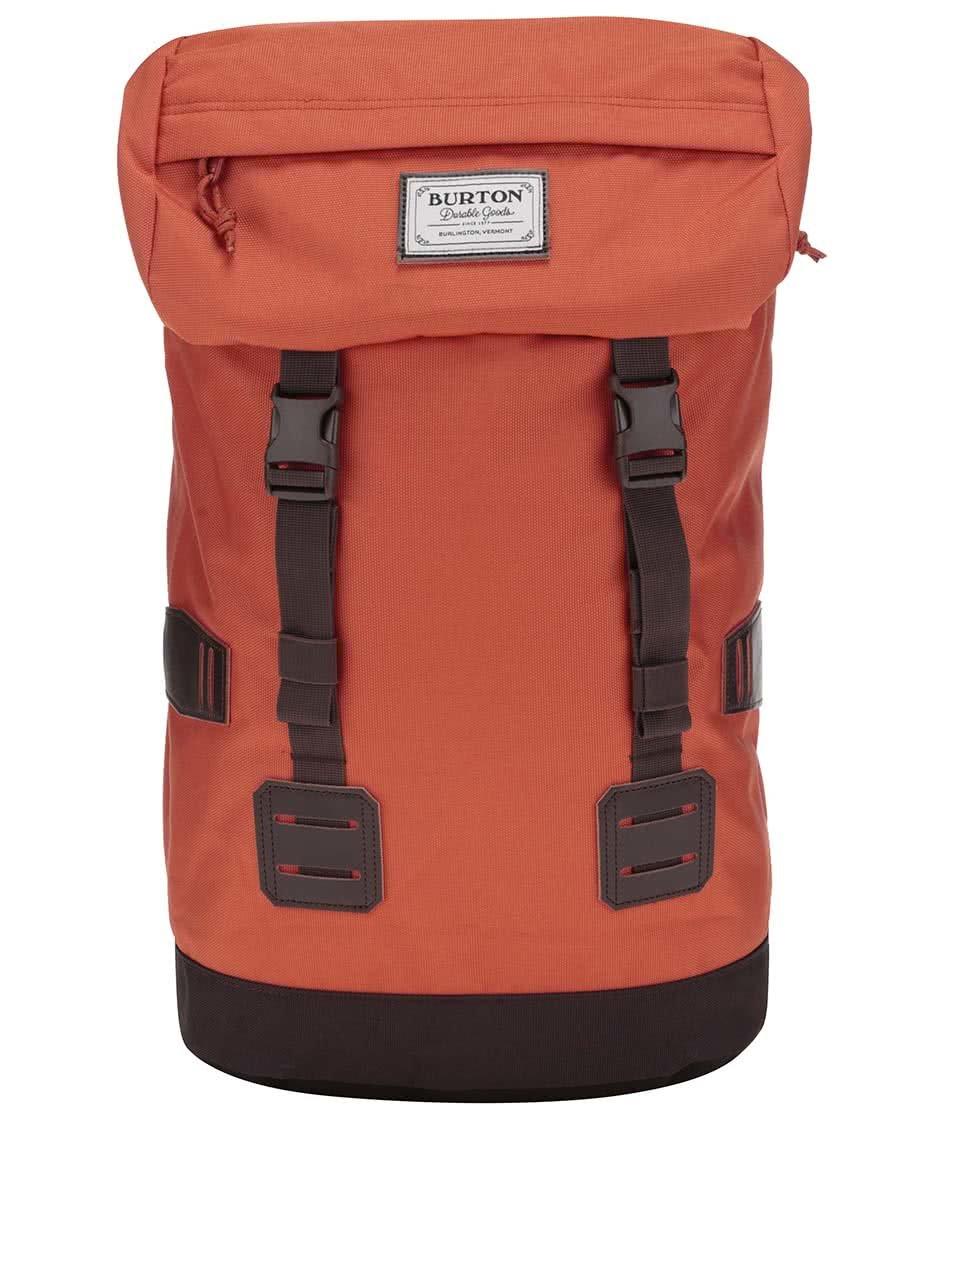 Hnědo-oranžový batoh Burton Tinder Pack